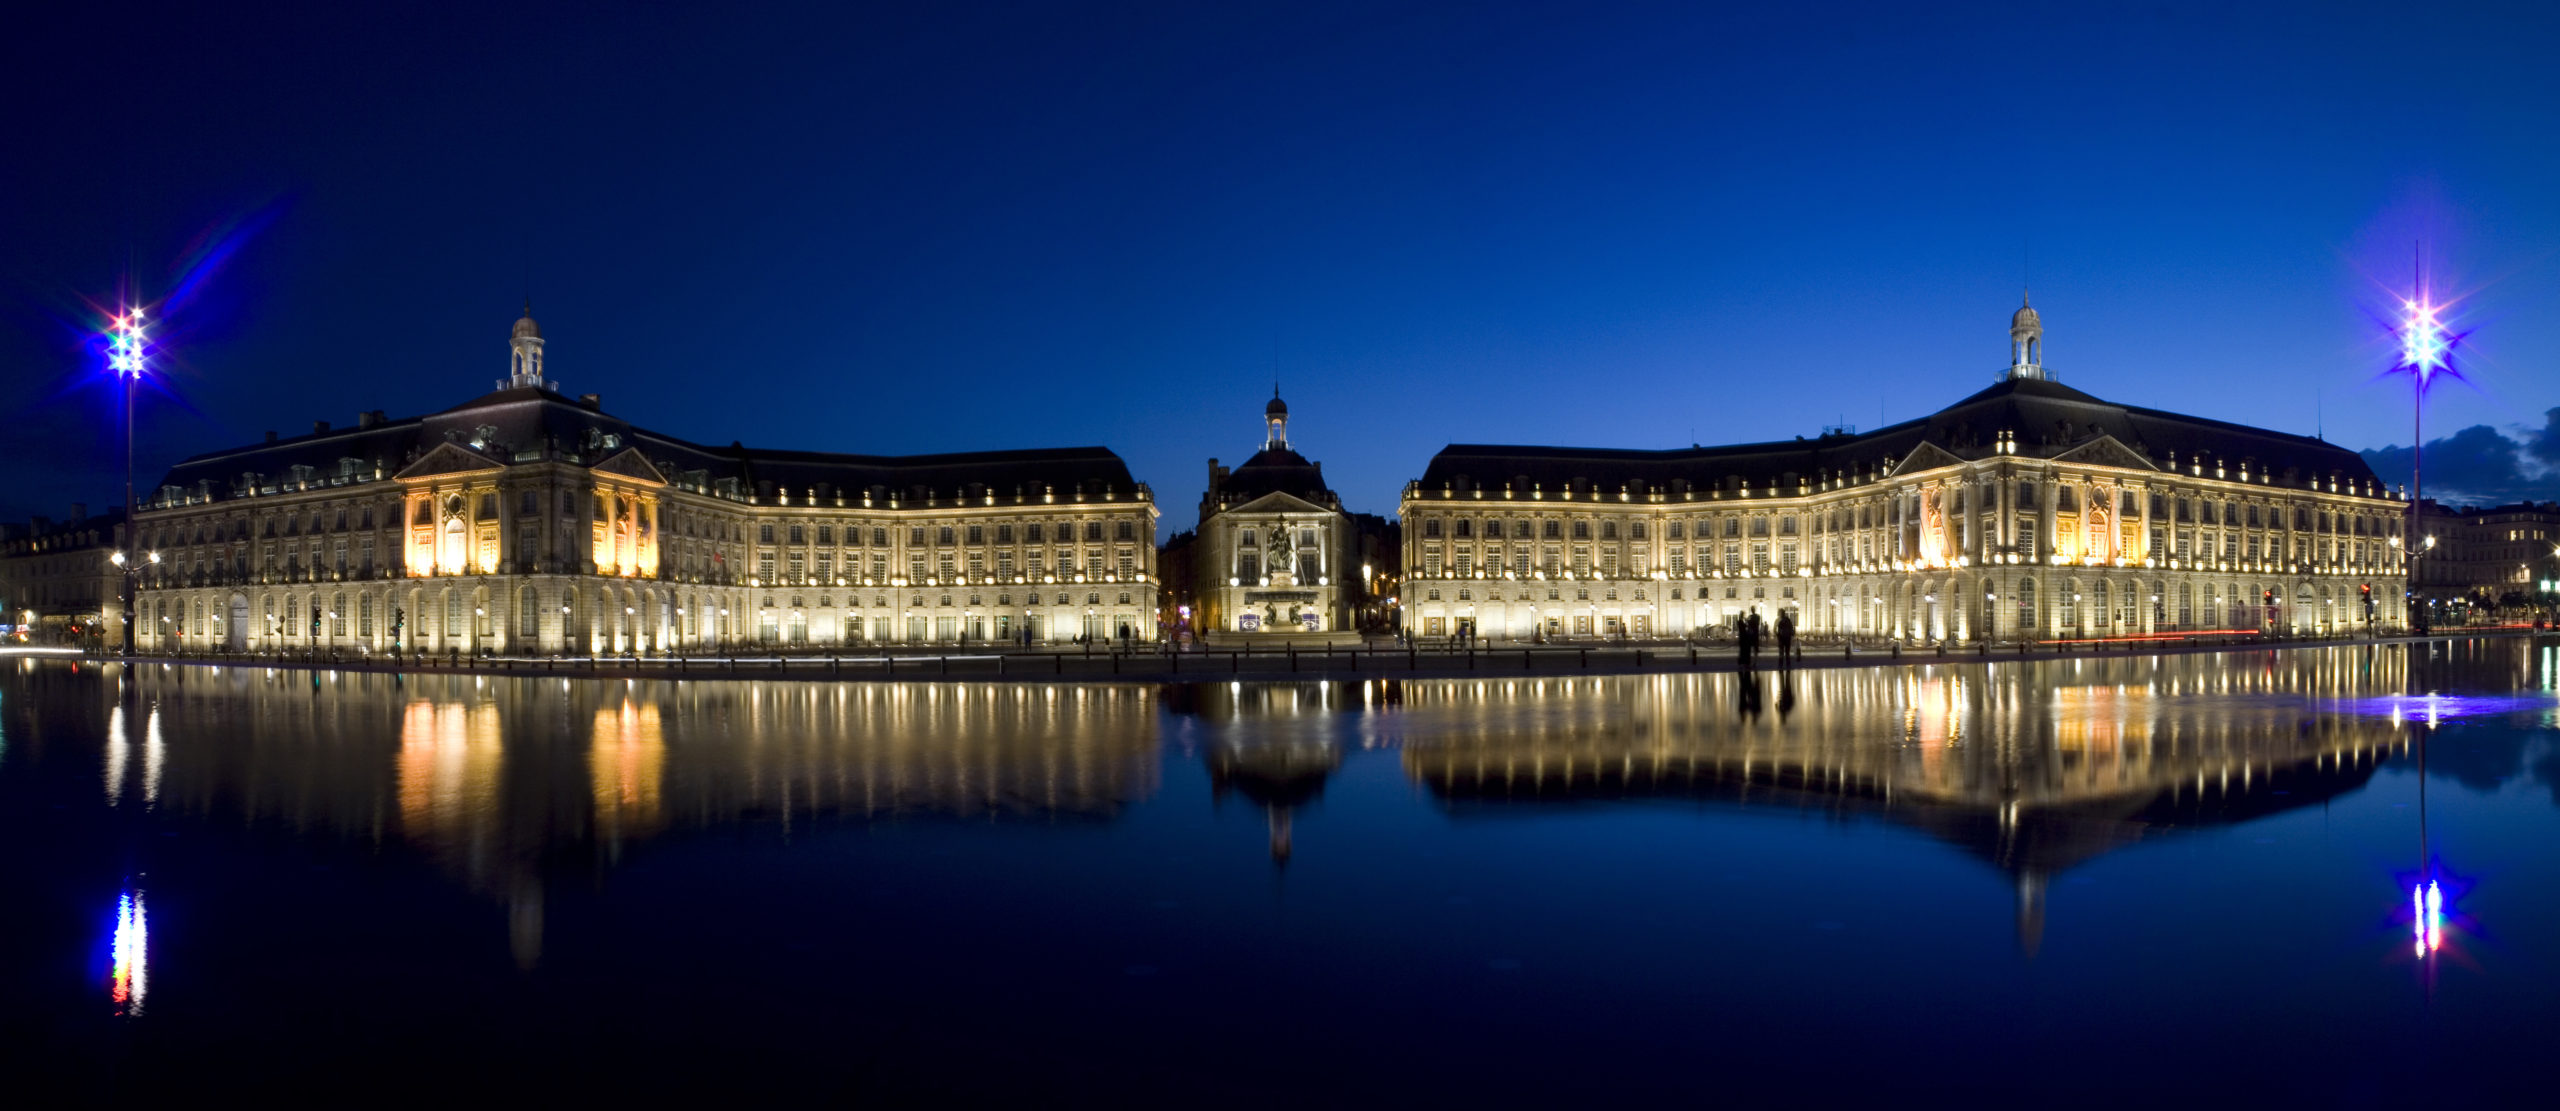 Bordeaux City - Banks of the Garonne